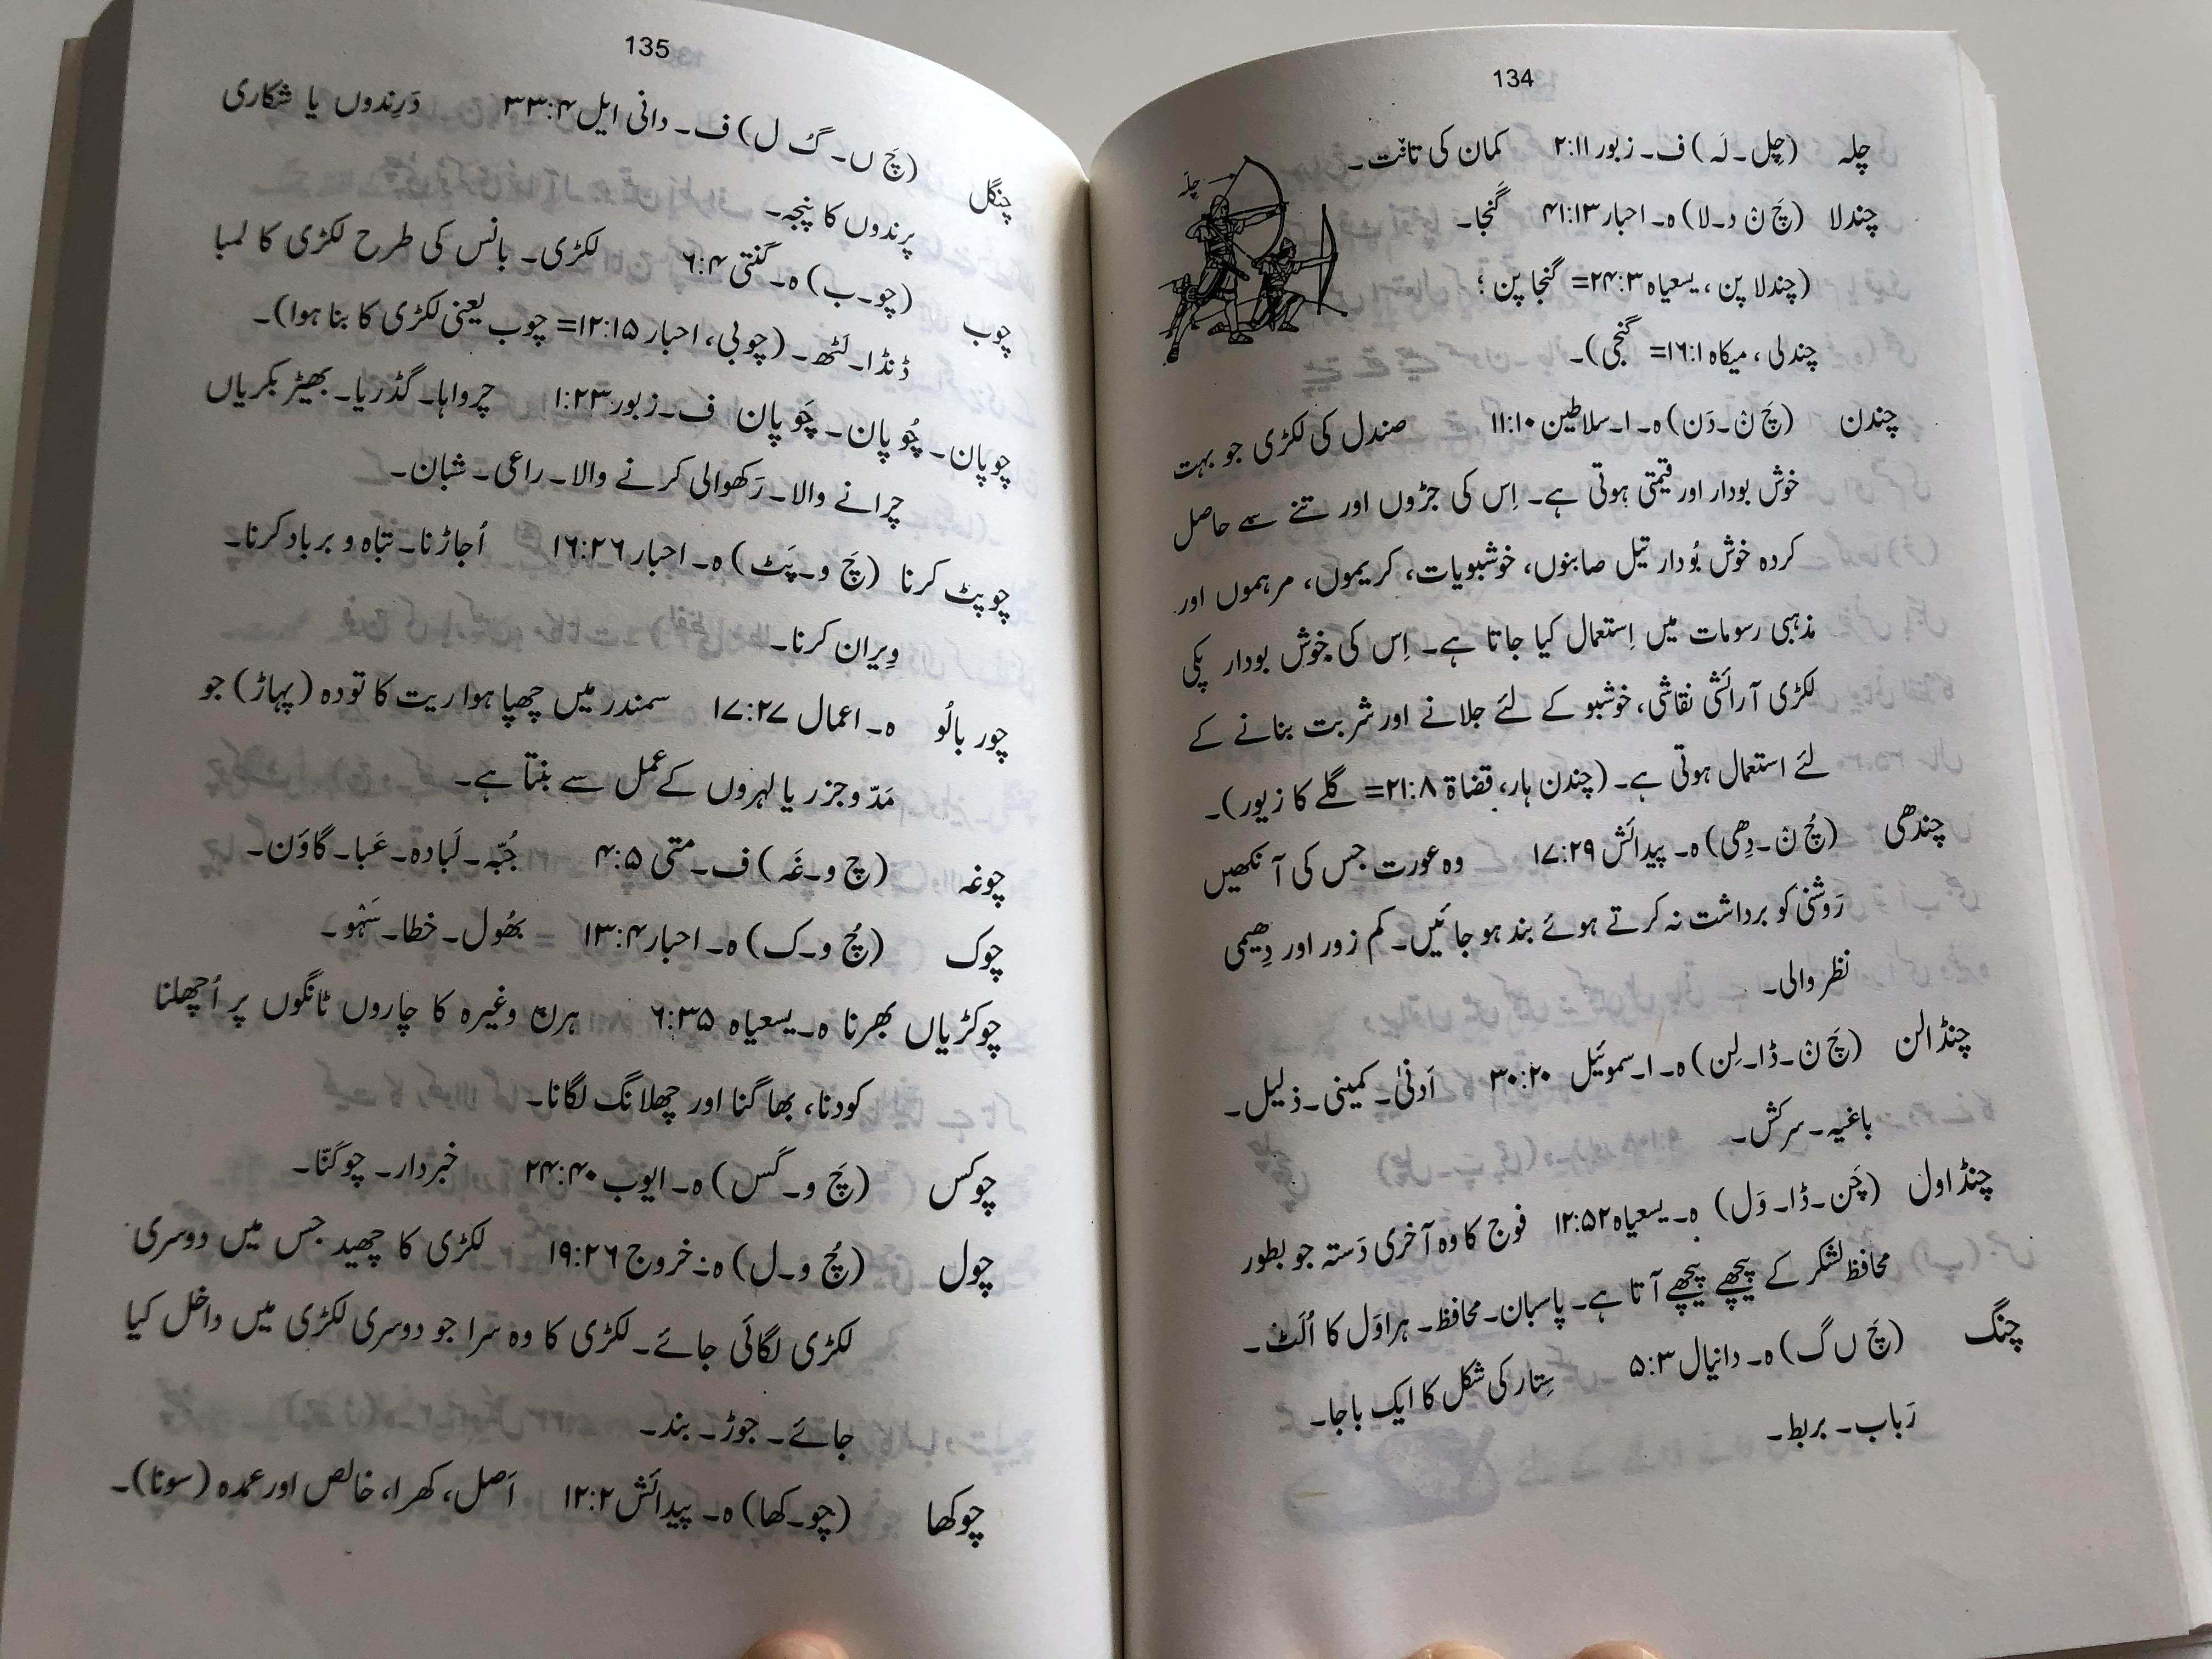 -dictionary-of-difficult-urdu-bible-words-by-younus-aamir-paperback-6-.jpg